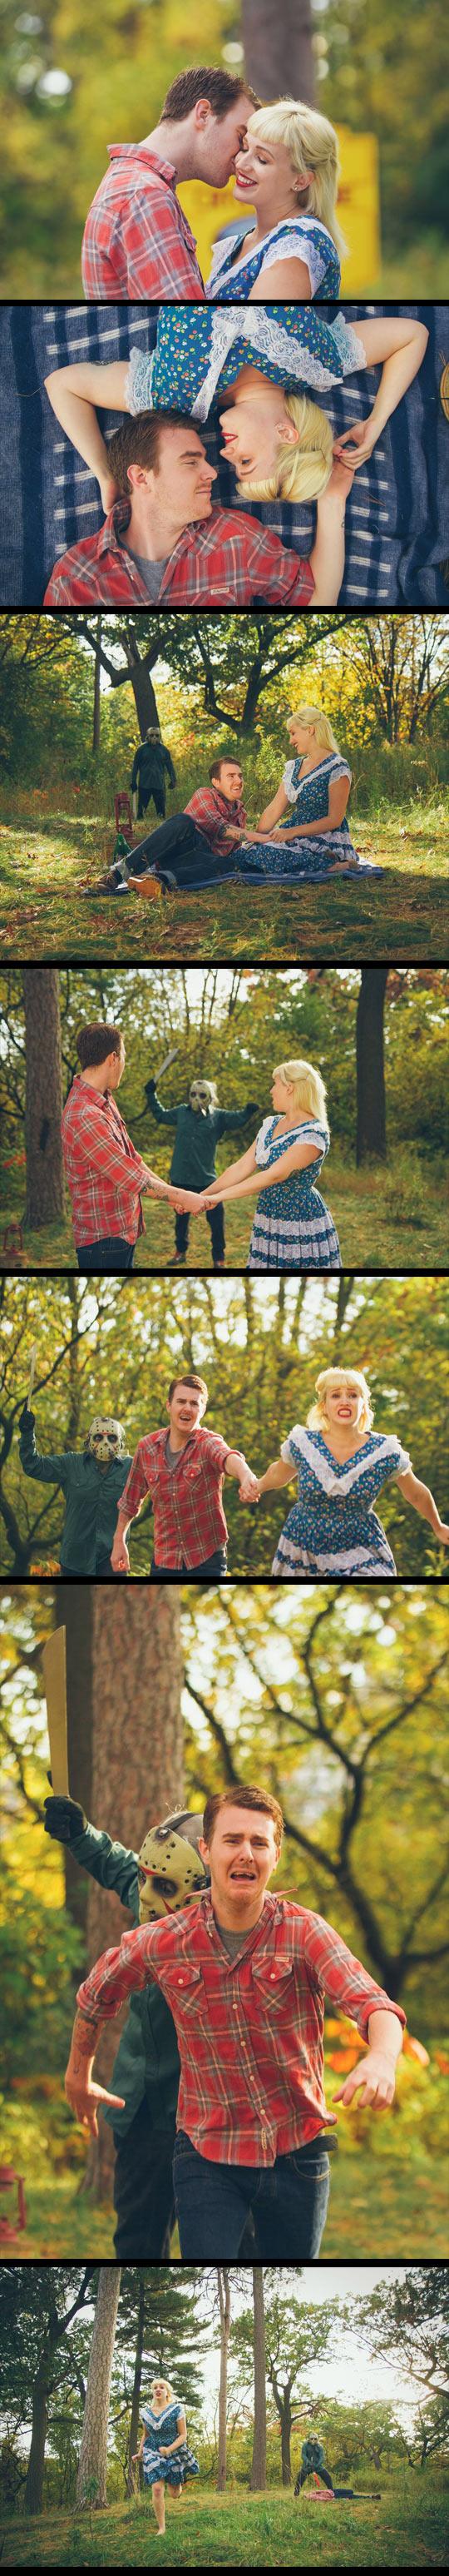 funny-couple-romantic-love-Jason